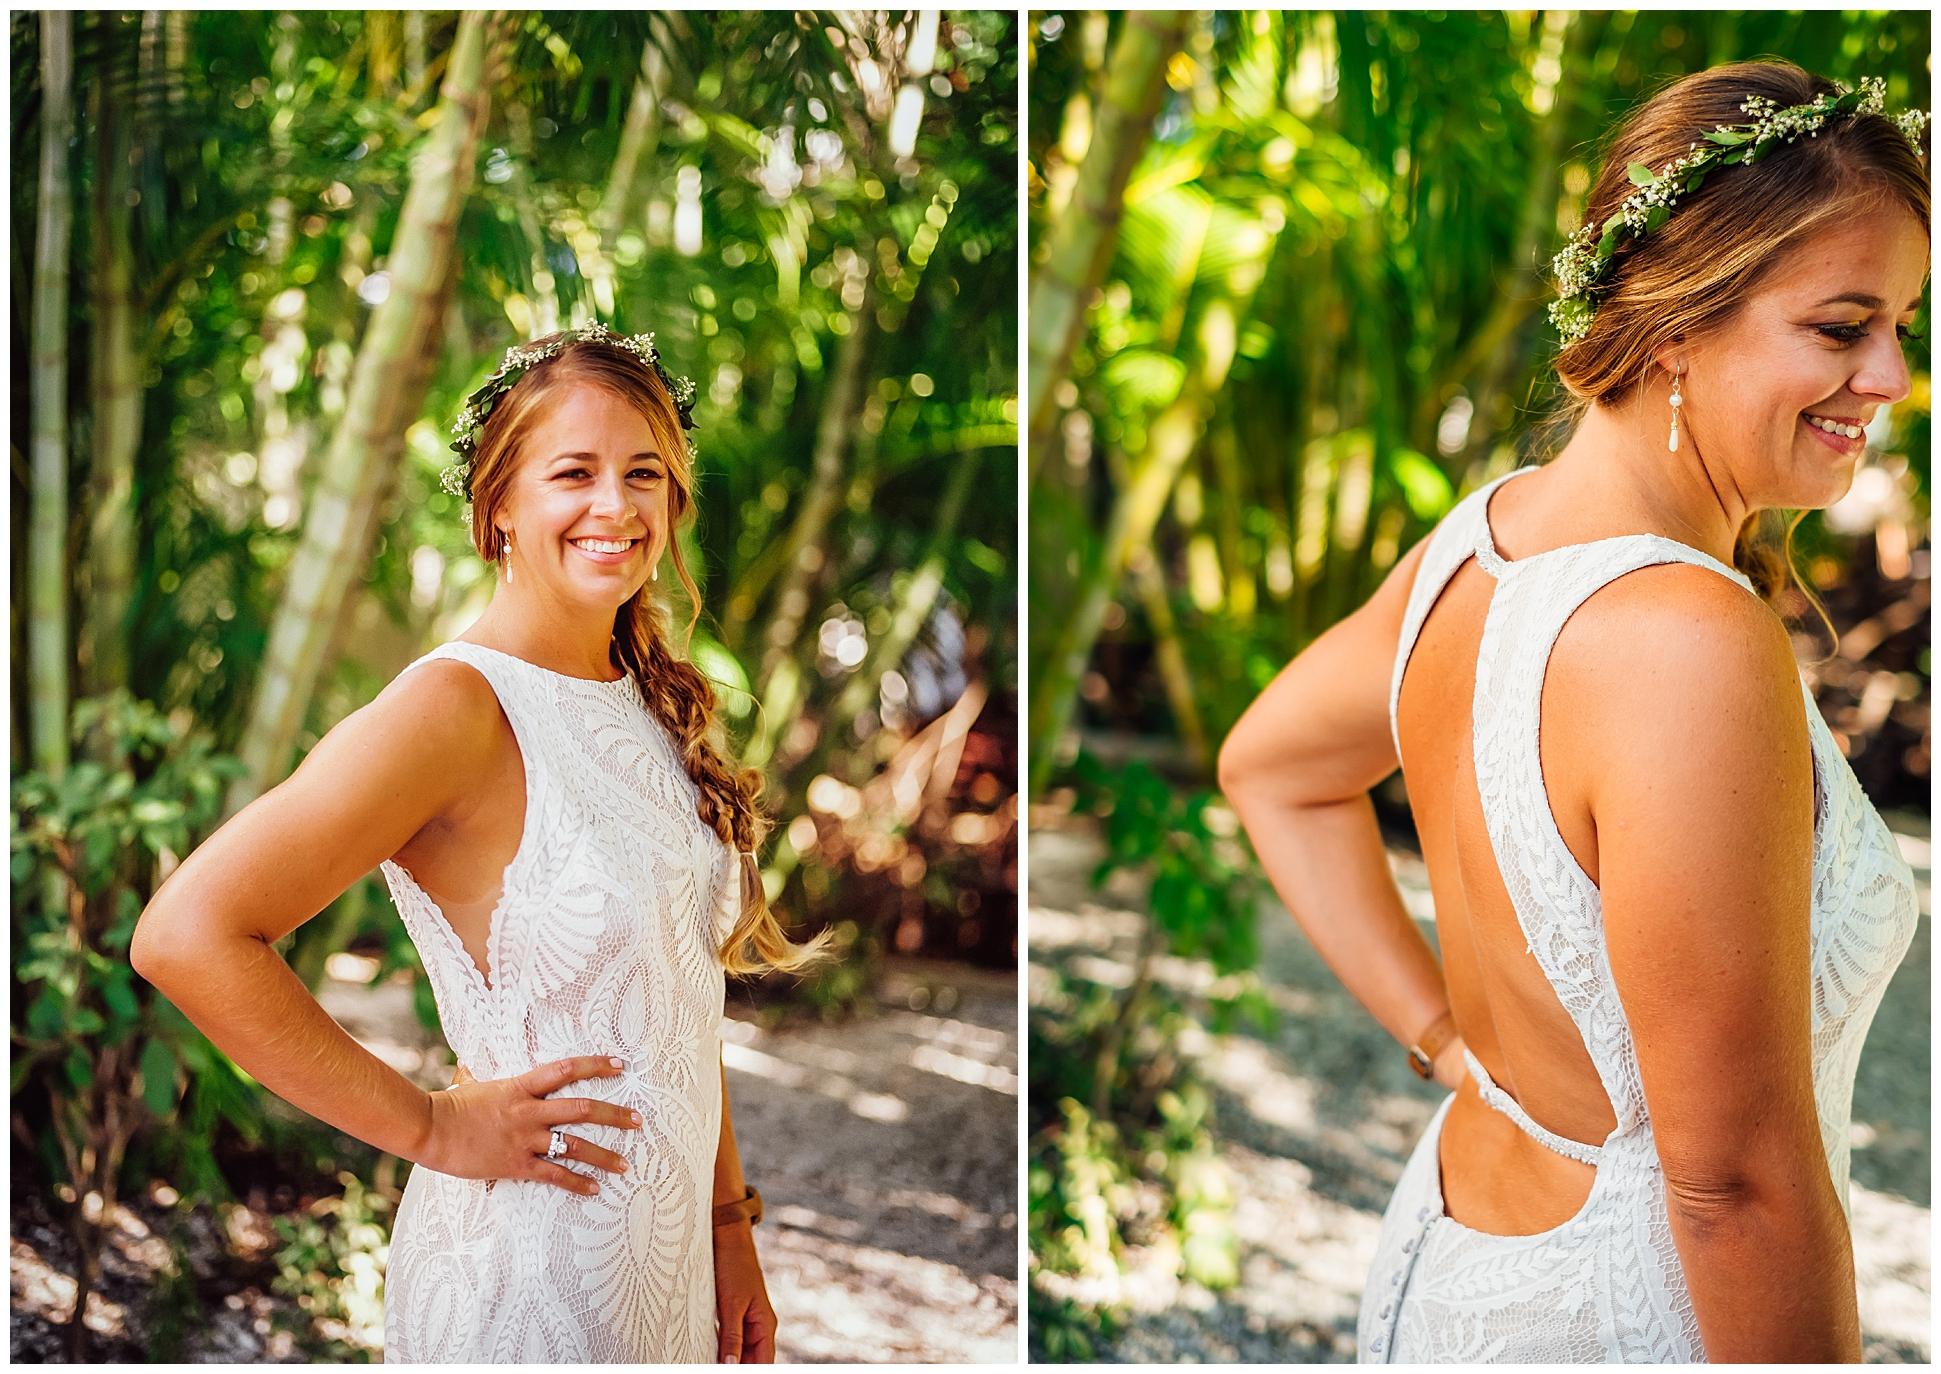 medium-format-film-vs-digital-wedding-photography-florida-beach_0002.jpg